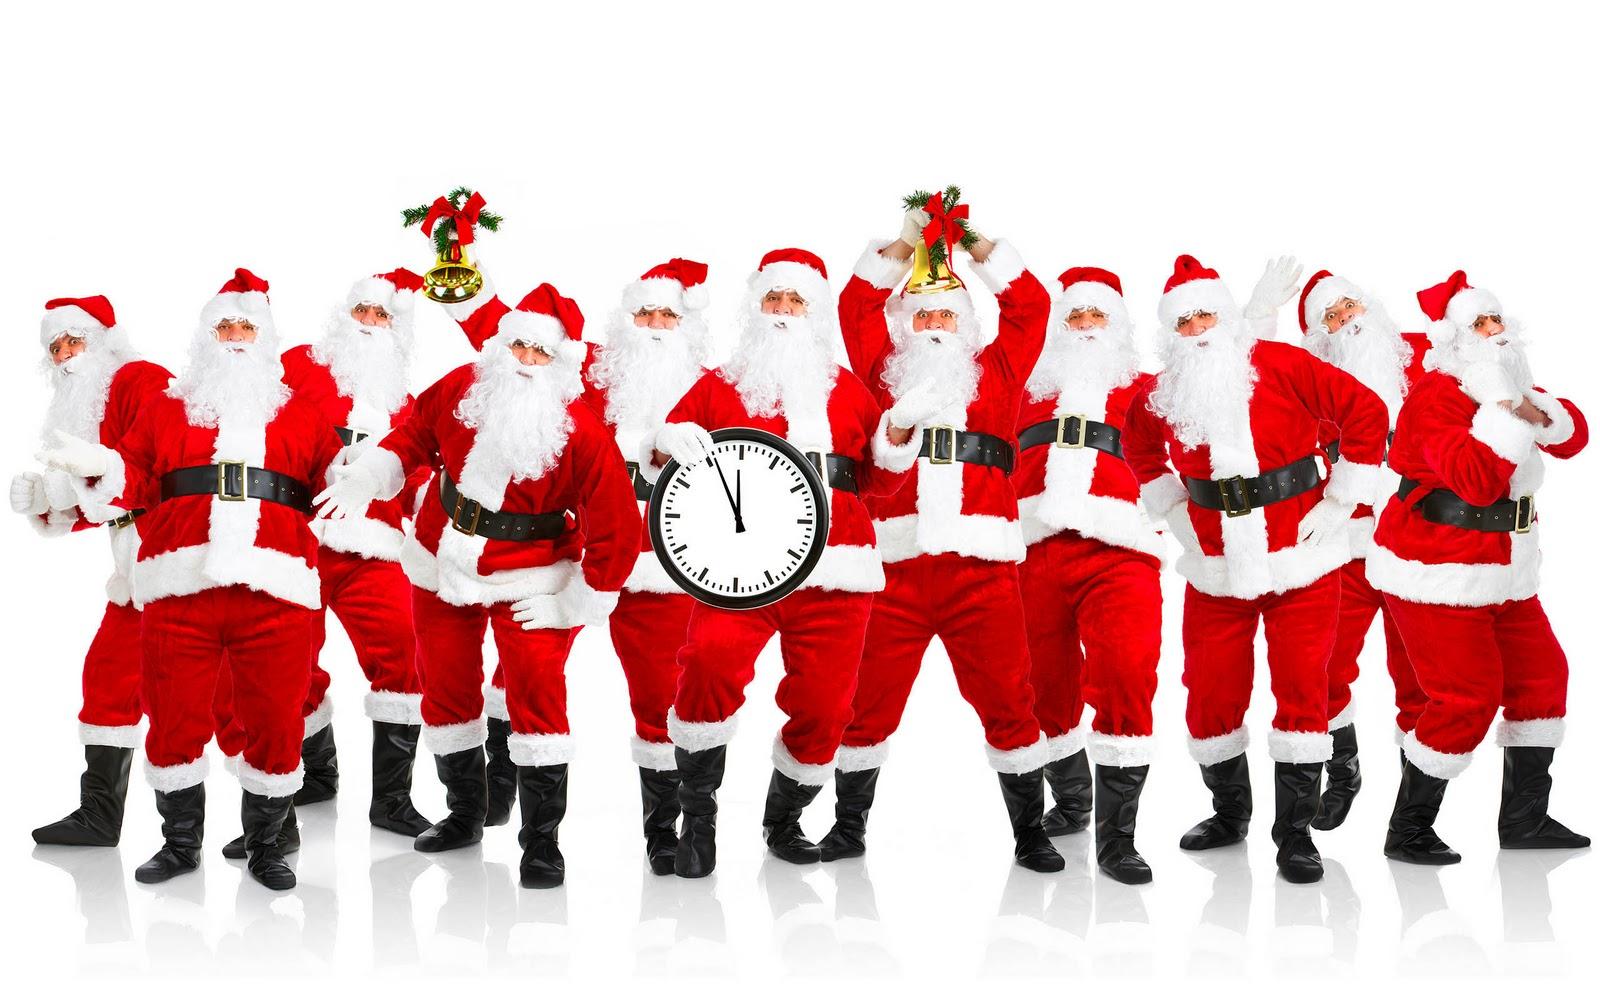 http://2.bp.blogspot.com/-GIQK_UEGLZg/Tq_SwcVFqgI/AAAAAAAAP1g/34inD6G4yMU/s1600/Mooie-kerstman-achtergronden-leuke-kerstman-wallpapers-afbeelding-plaatje-foto-8.jpg